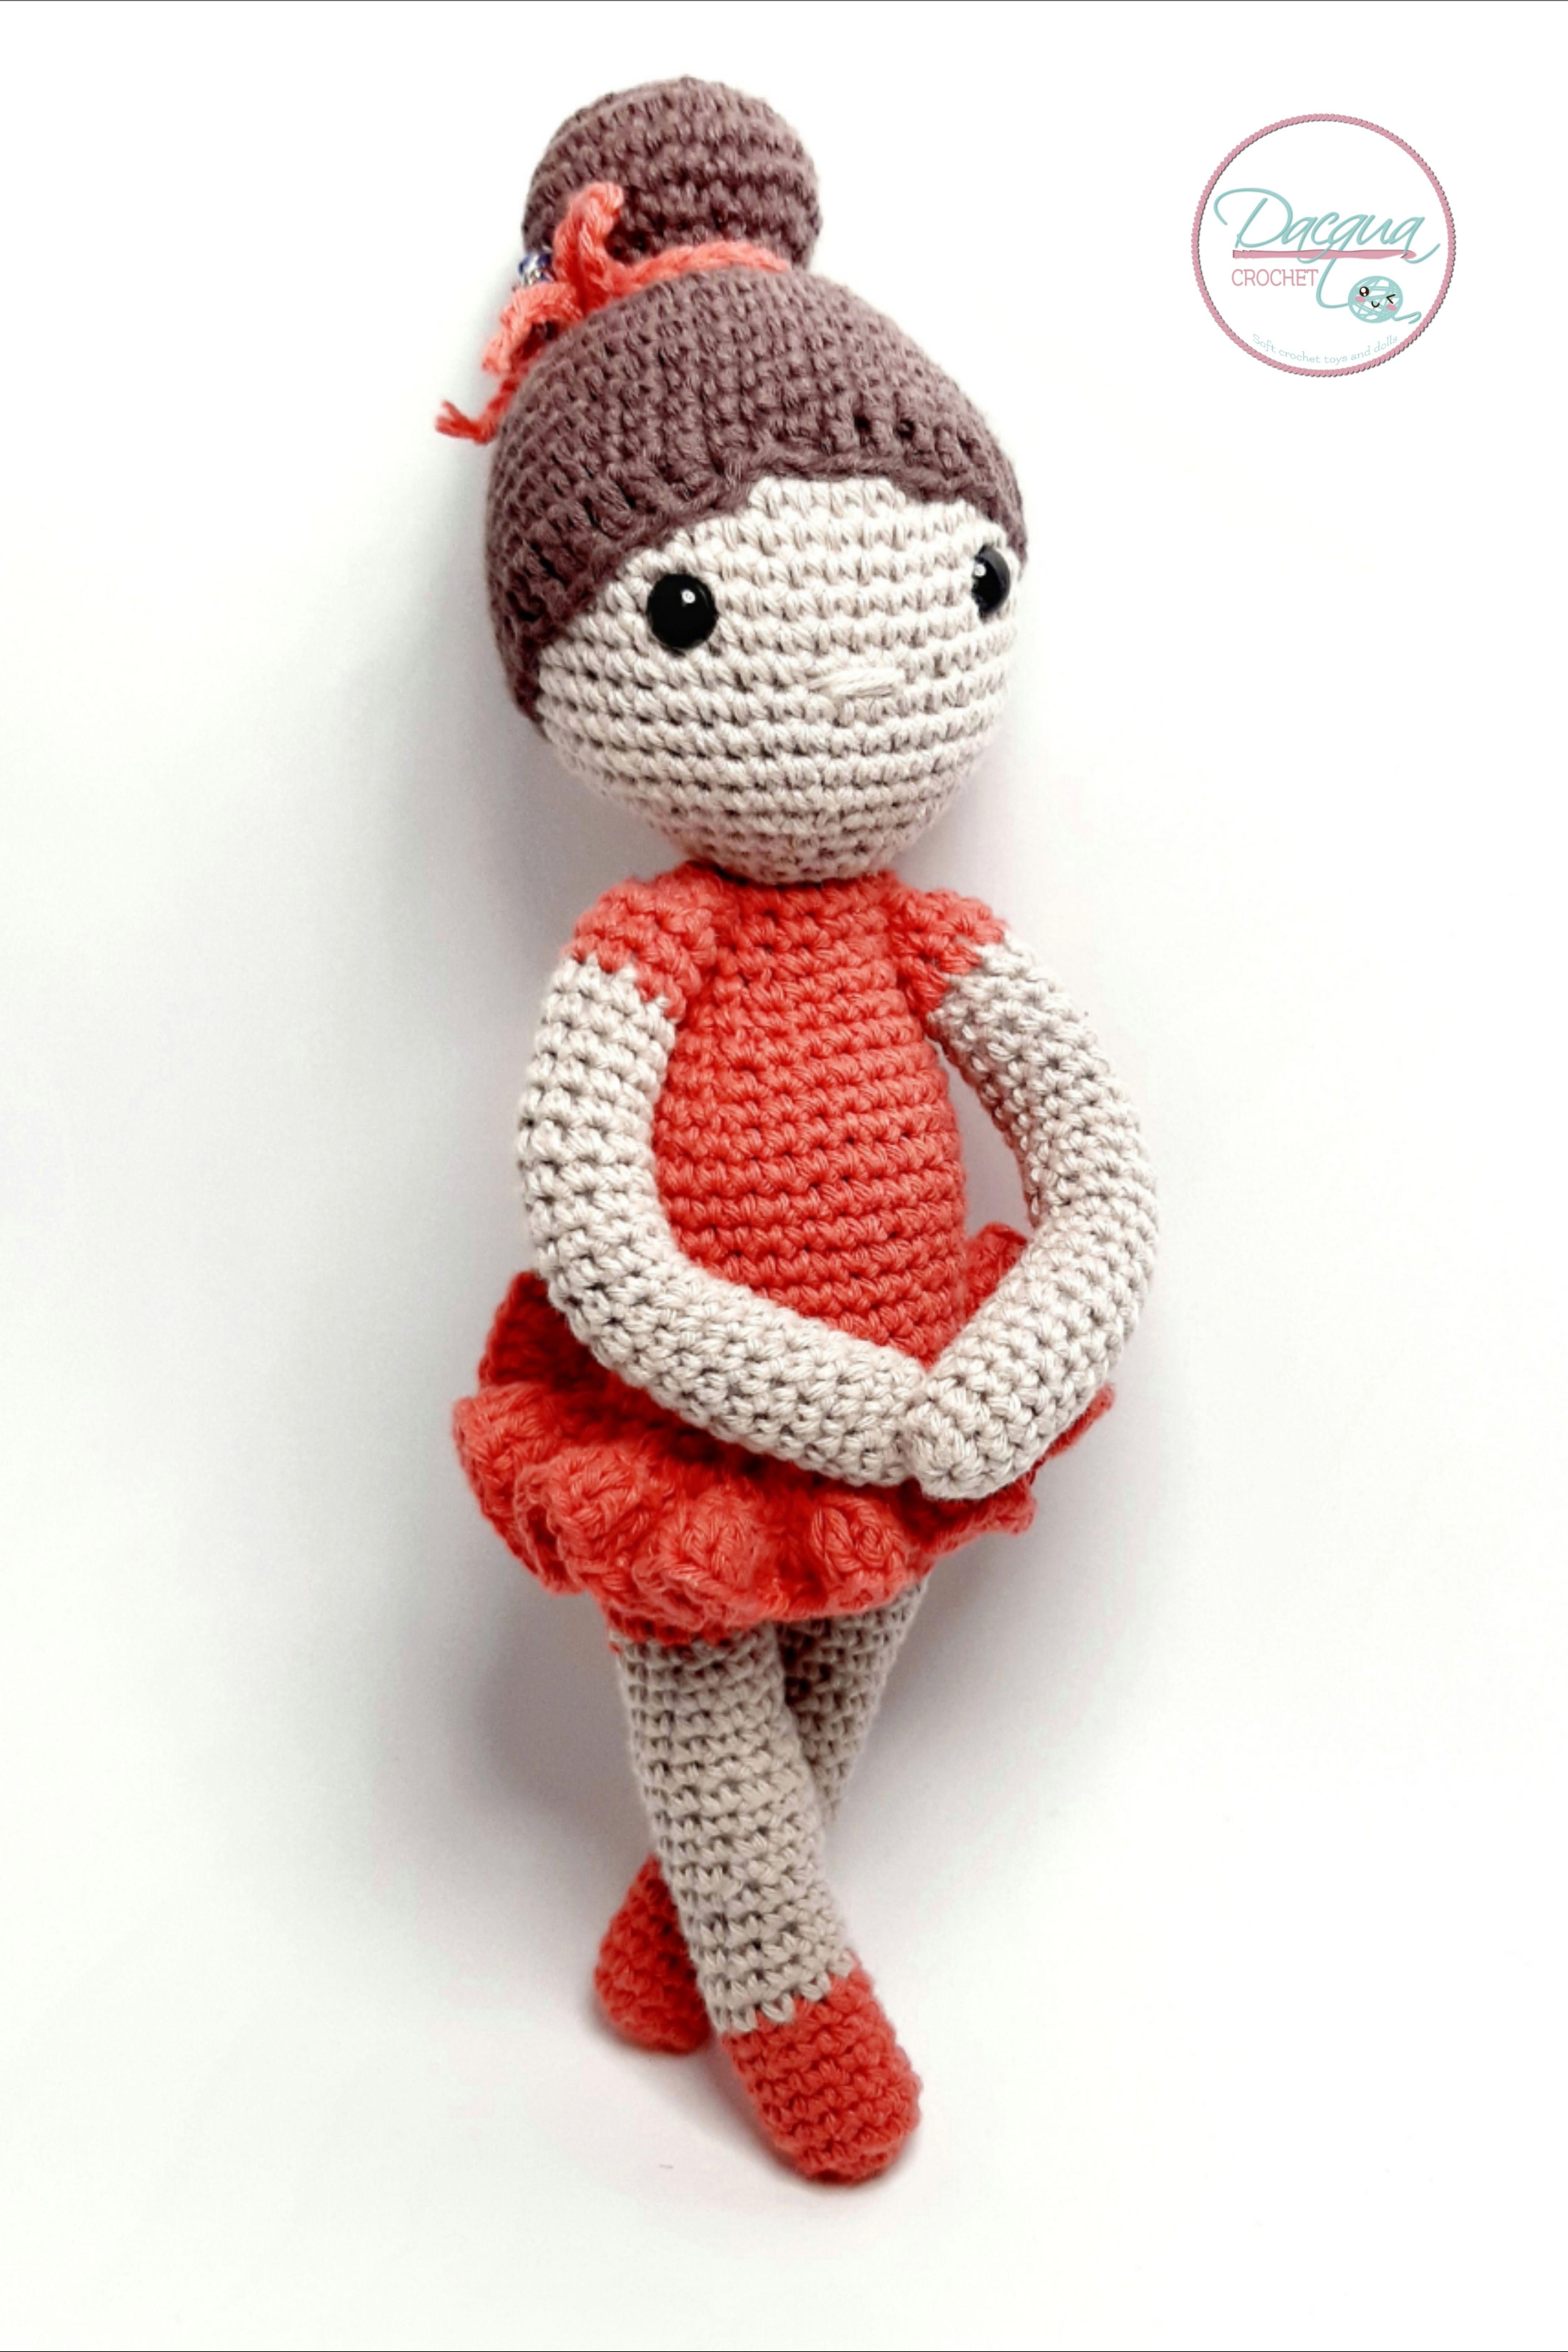 Ballerina bionda amigurumi 4 - magiedifilo.it punto croce ... | 6582x4388